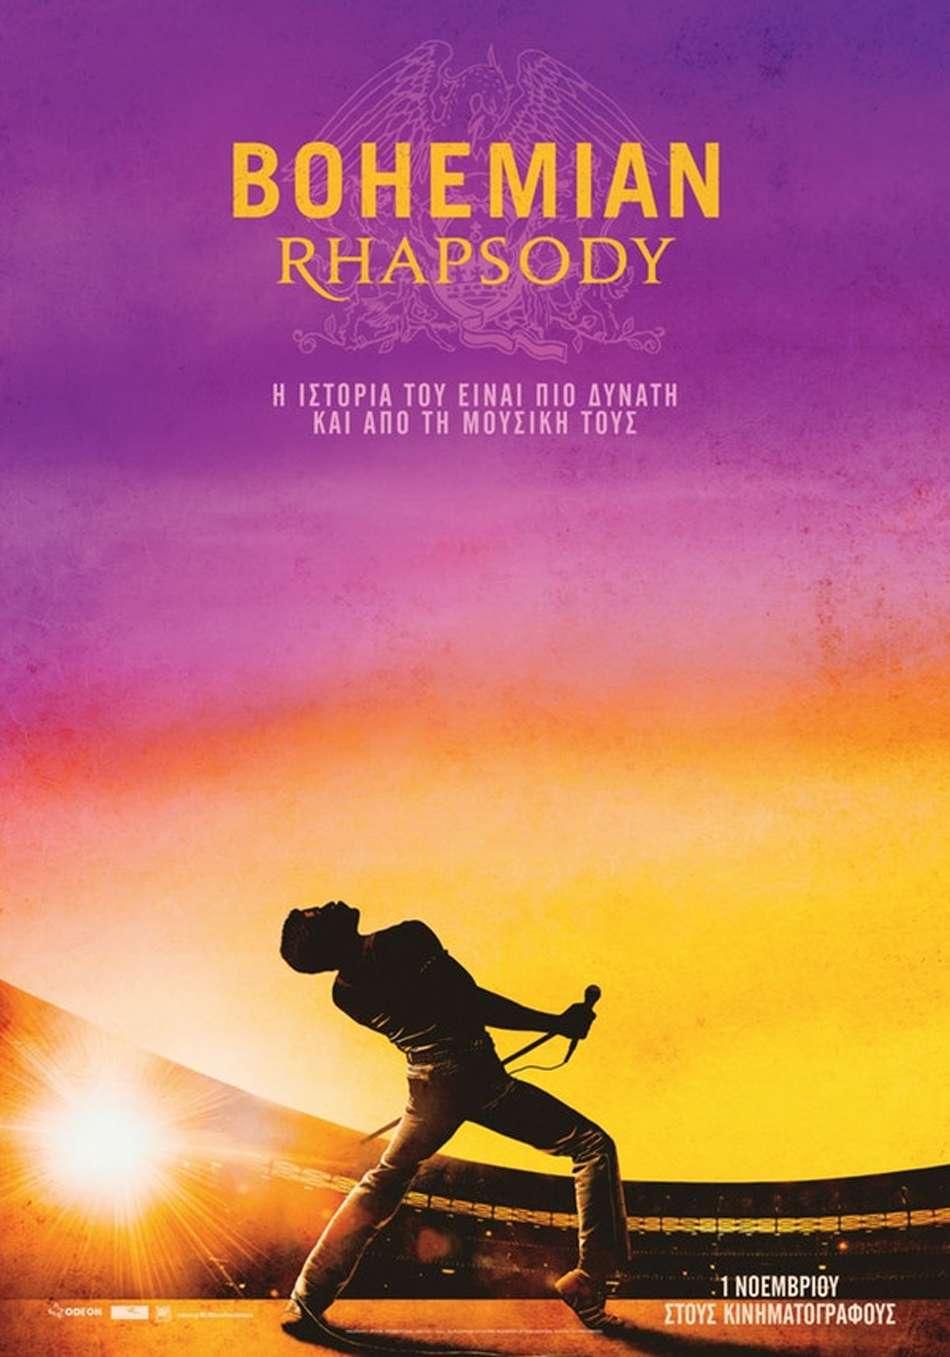 Bohemian Rhapsody Poster Πόστερ